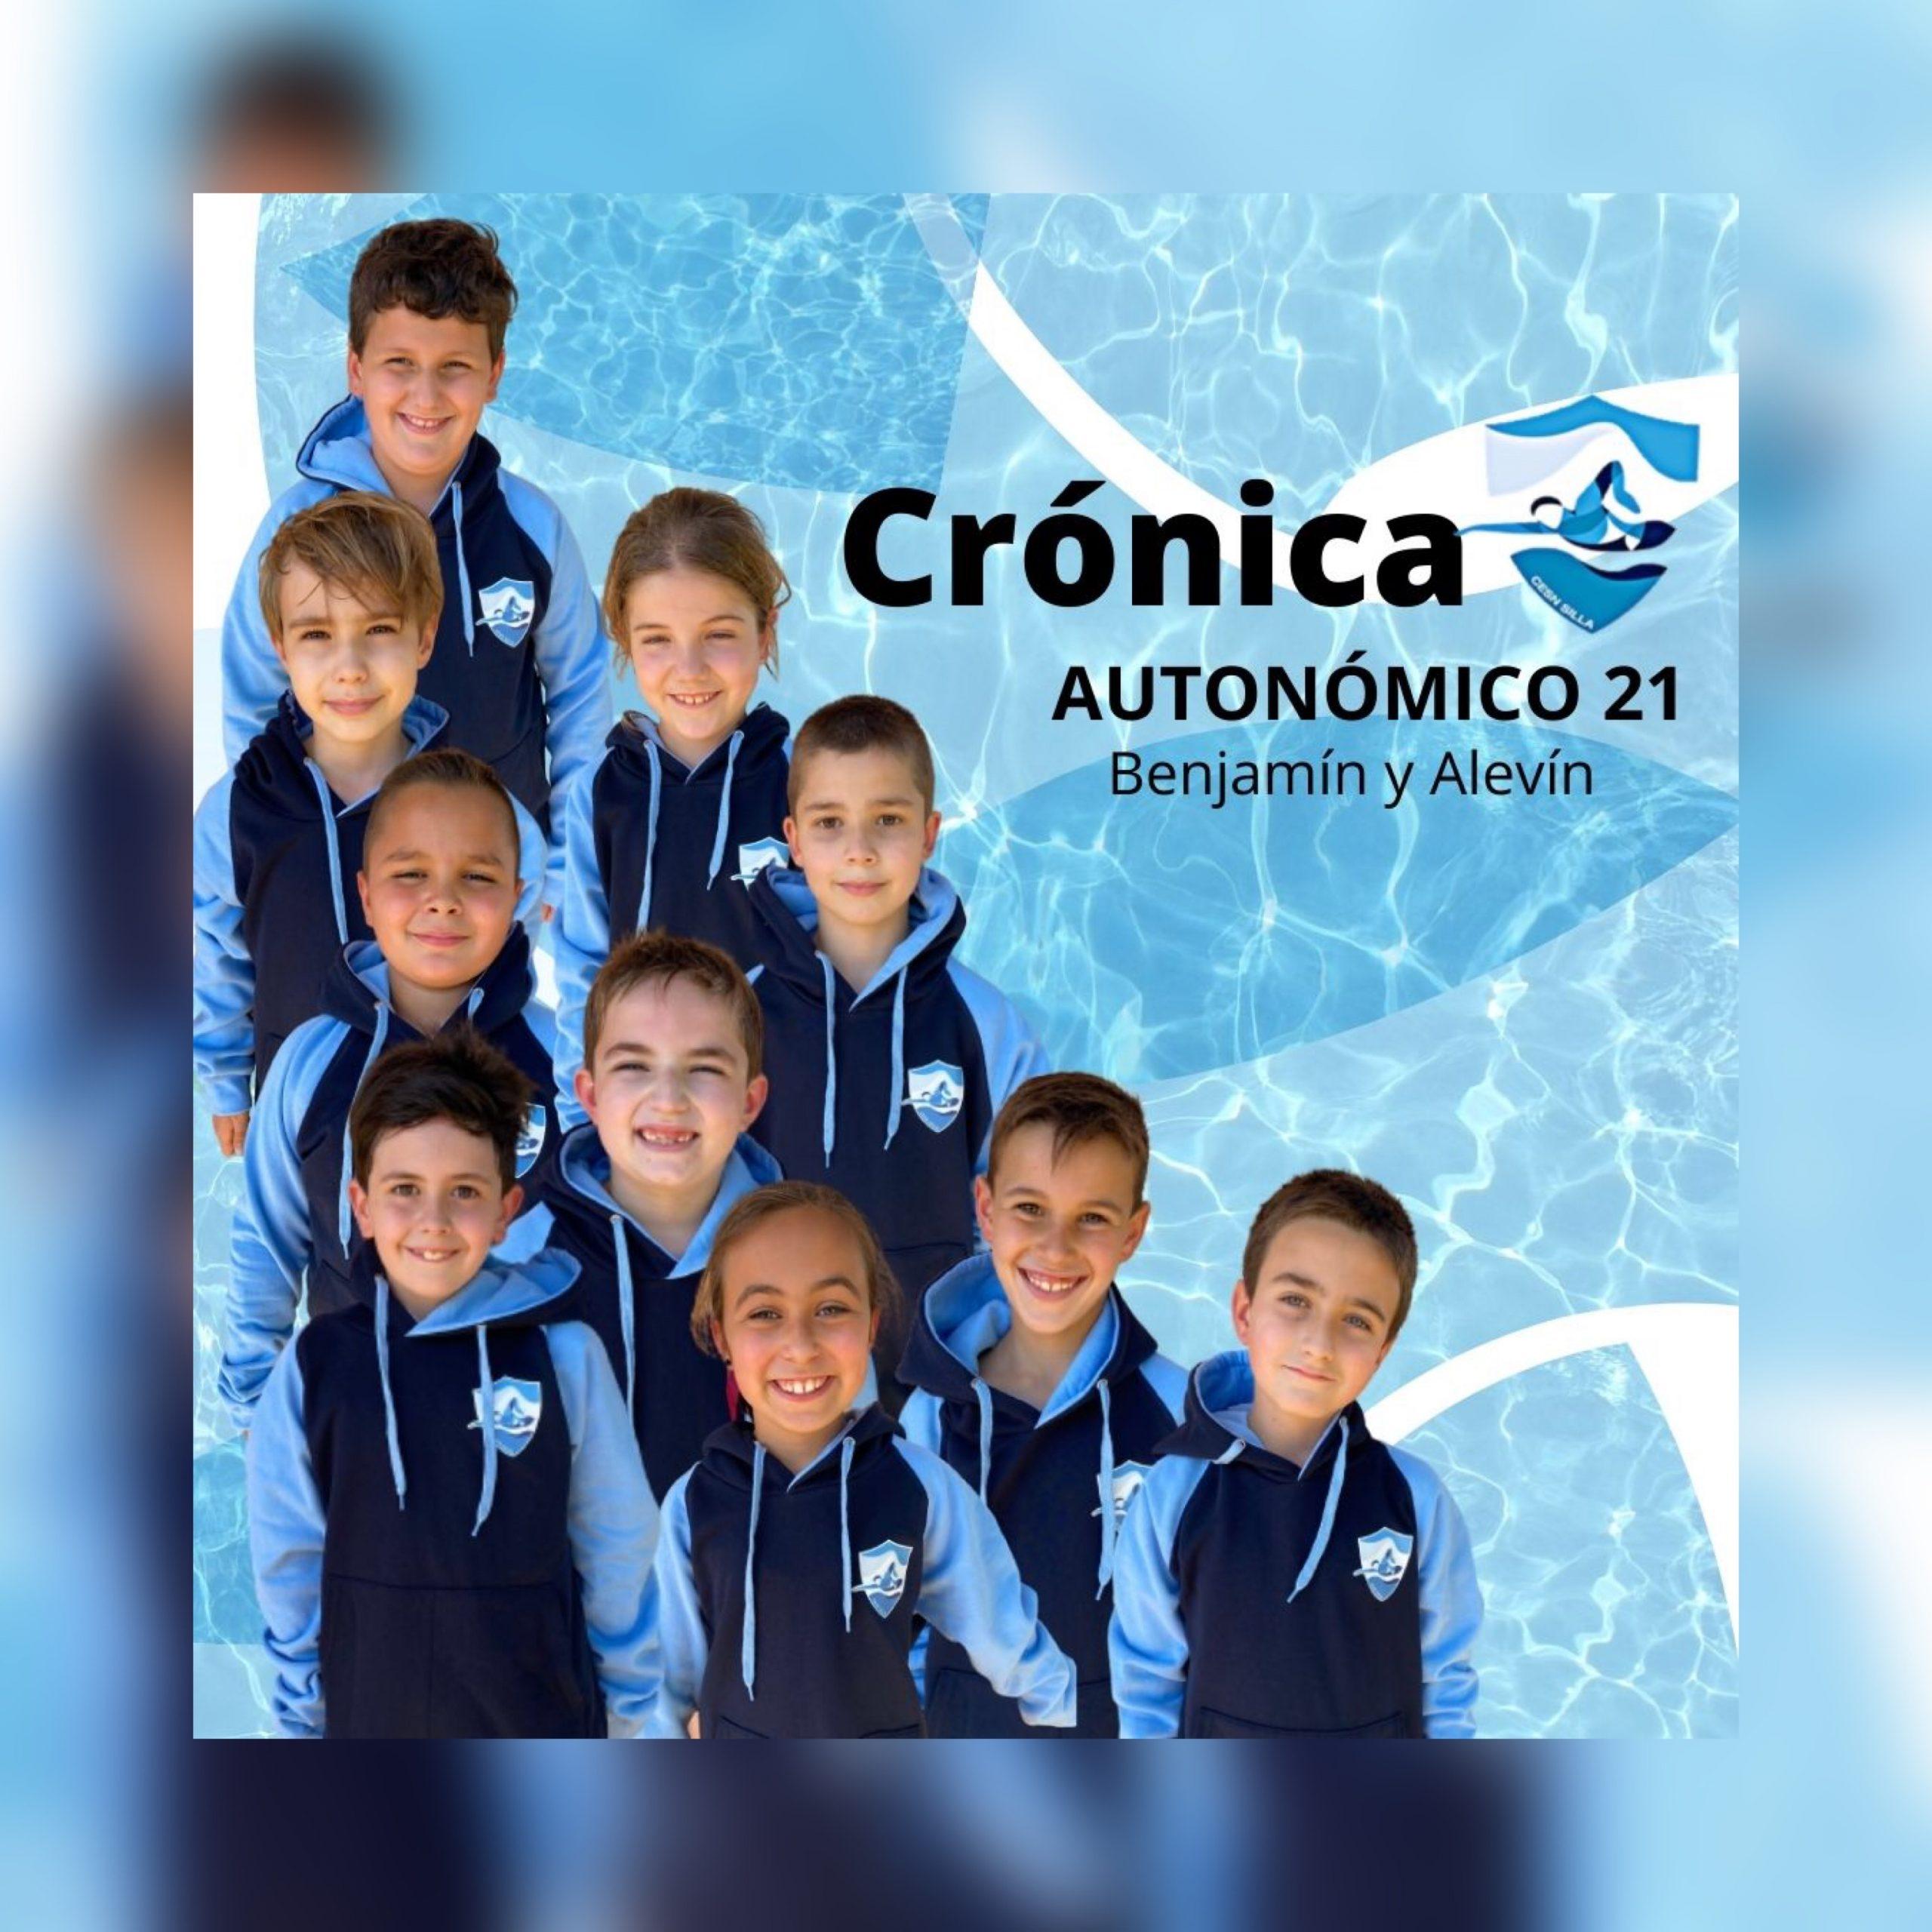 Crónica Autonómico benj-alevín post